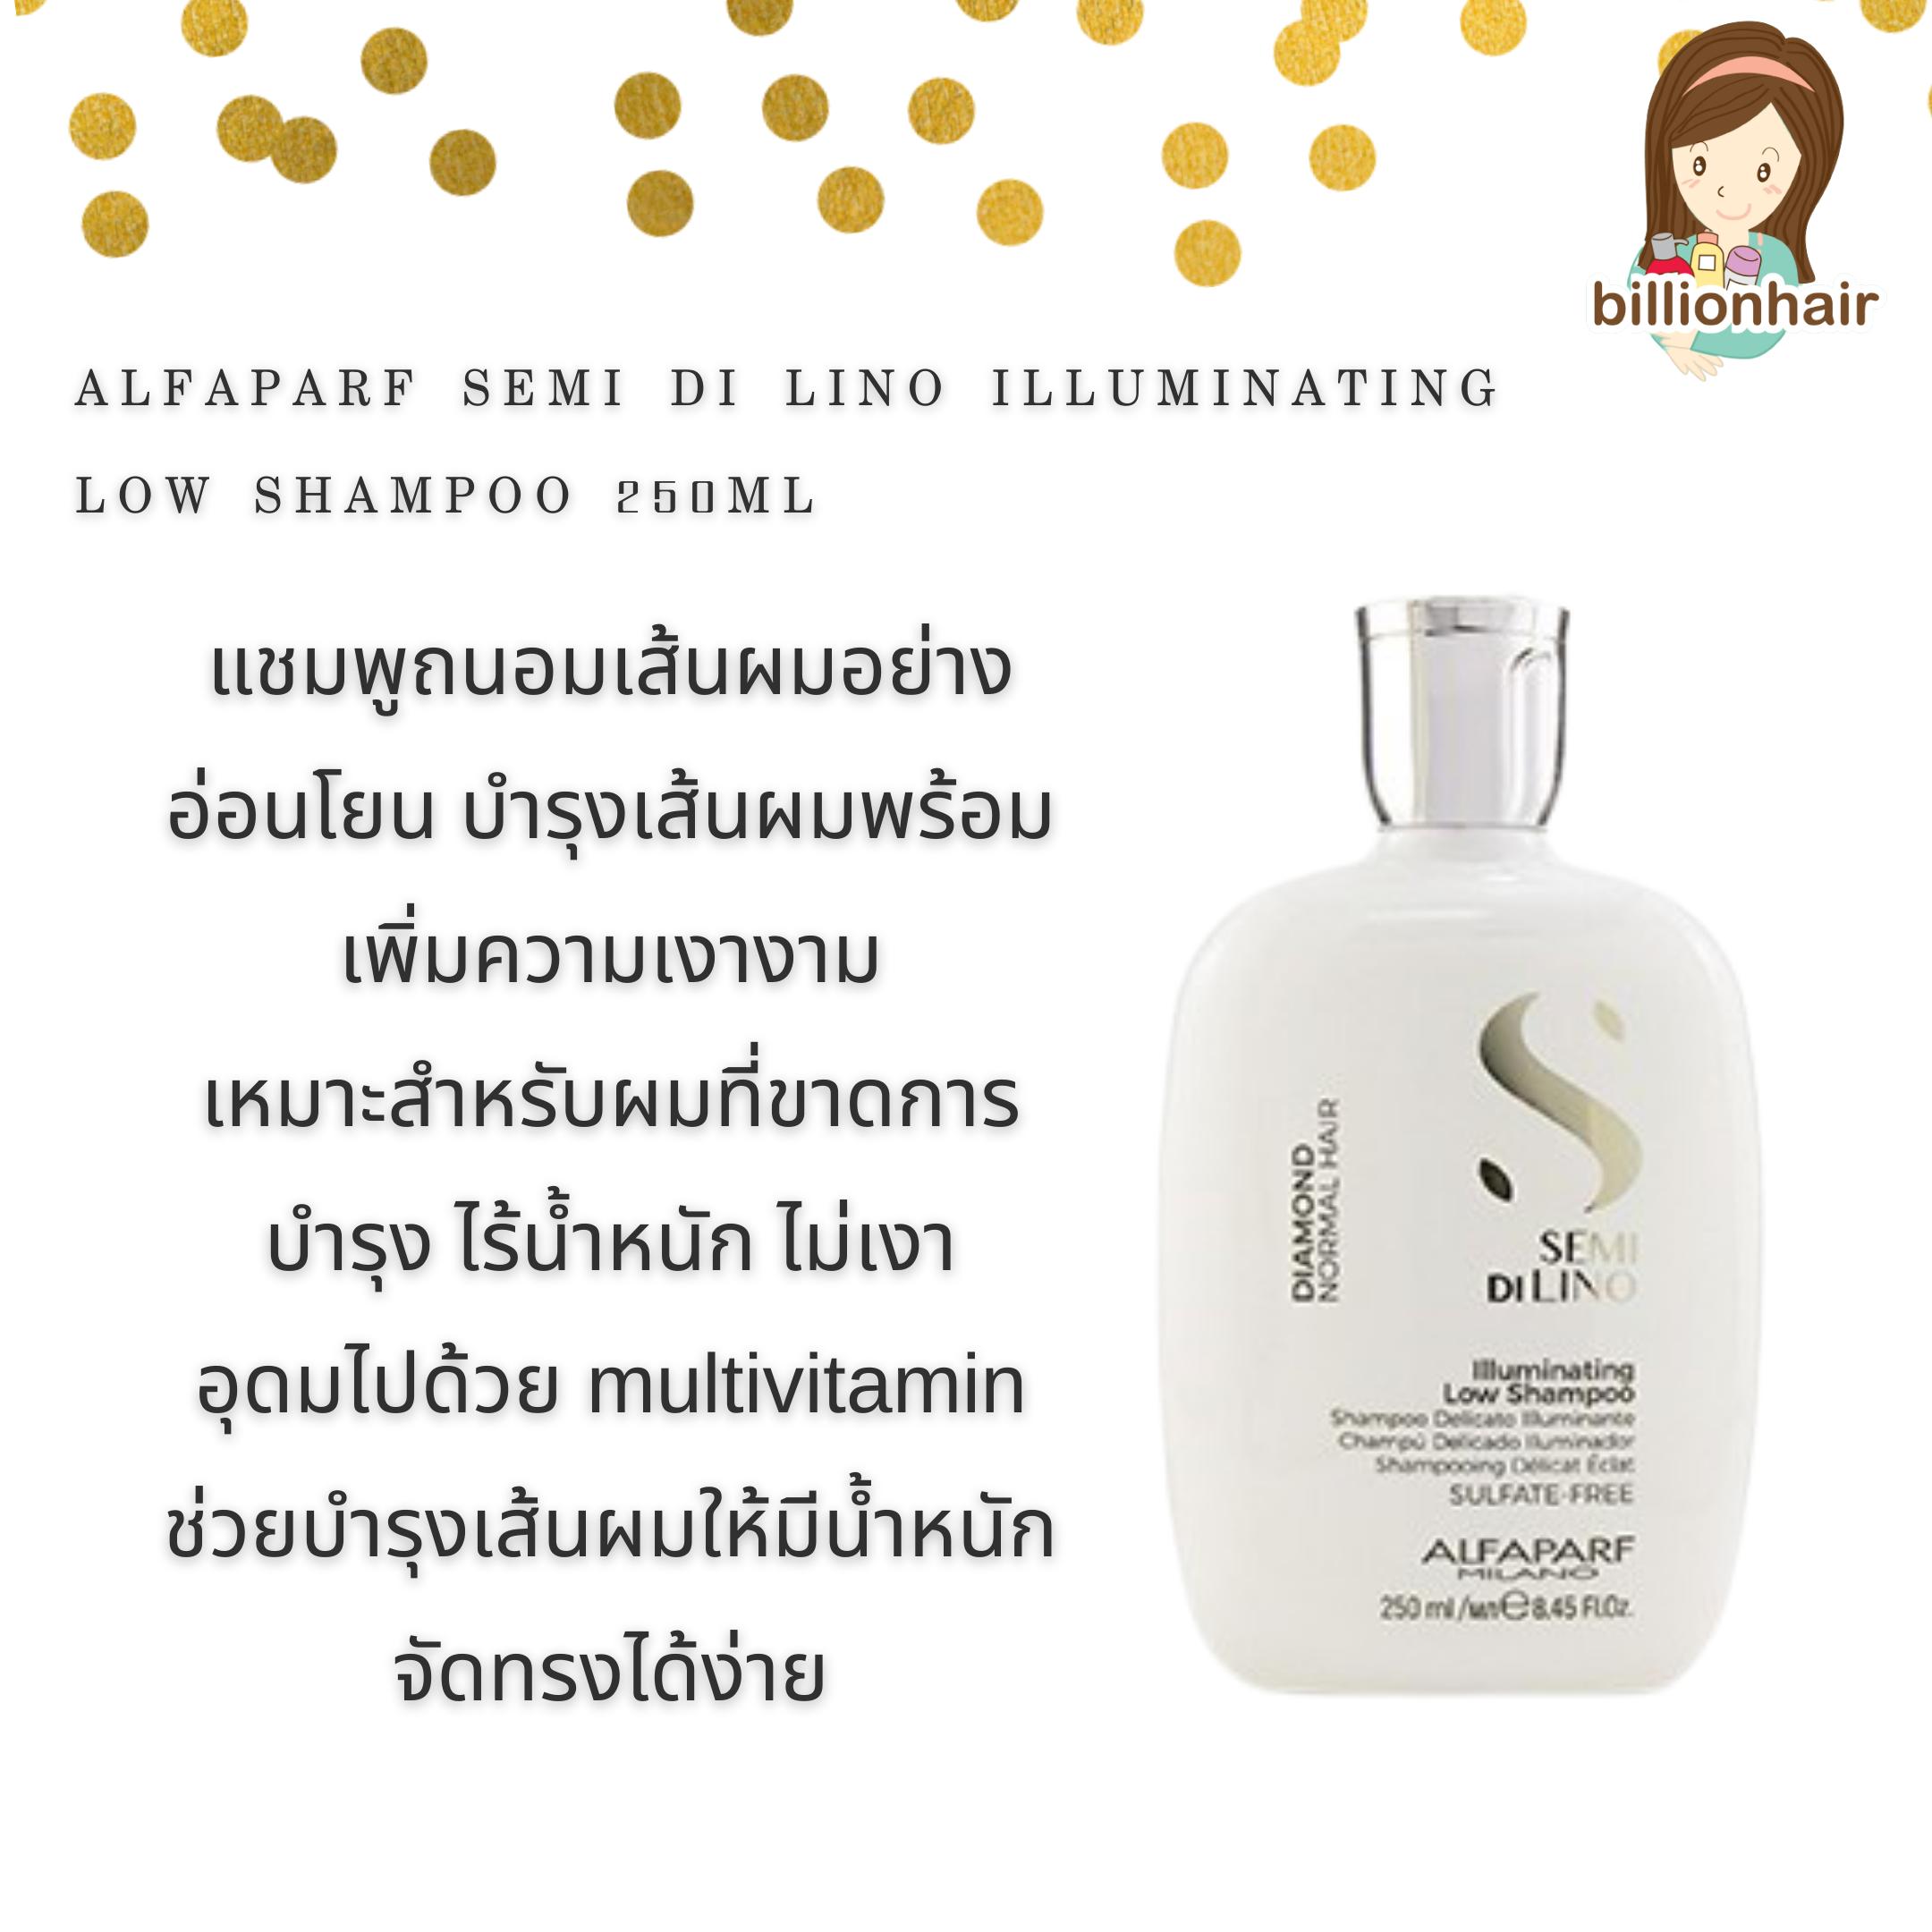 Alfaparf semi di lino illuminating low shampoo 250ml แชมพูถนอมเส้นผมอย่างอ่อนโยน บำรุงเส้นผมอย่างอ่อนโยนพร้อมเพิ่มความเงางาม